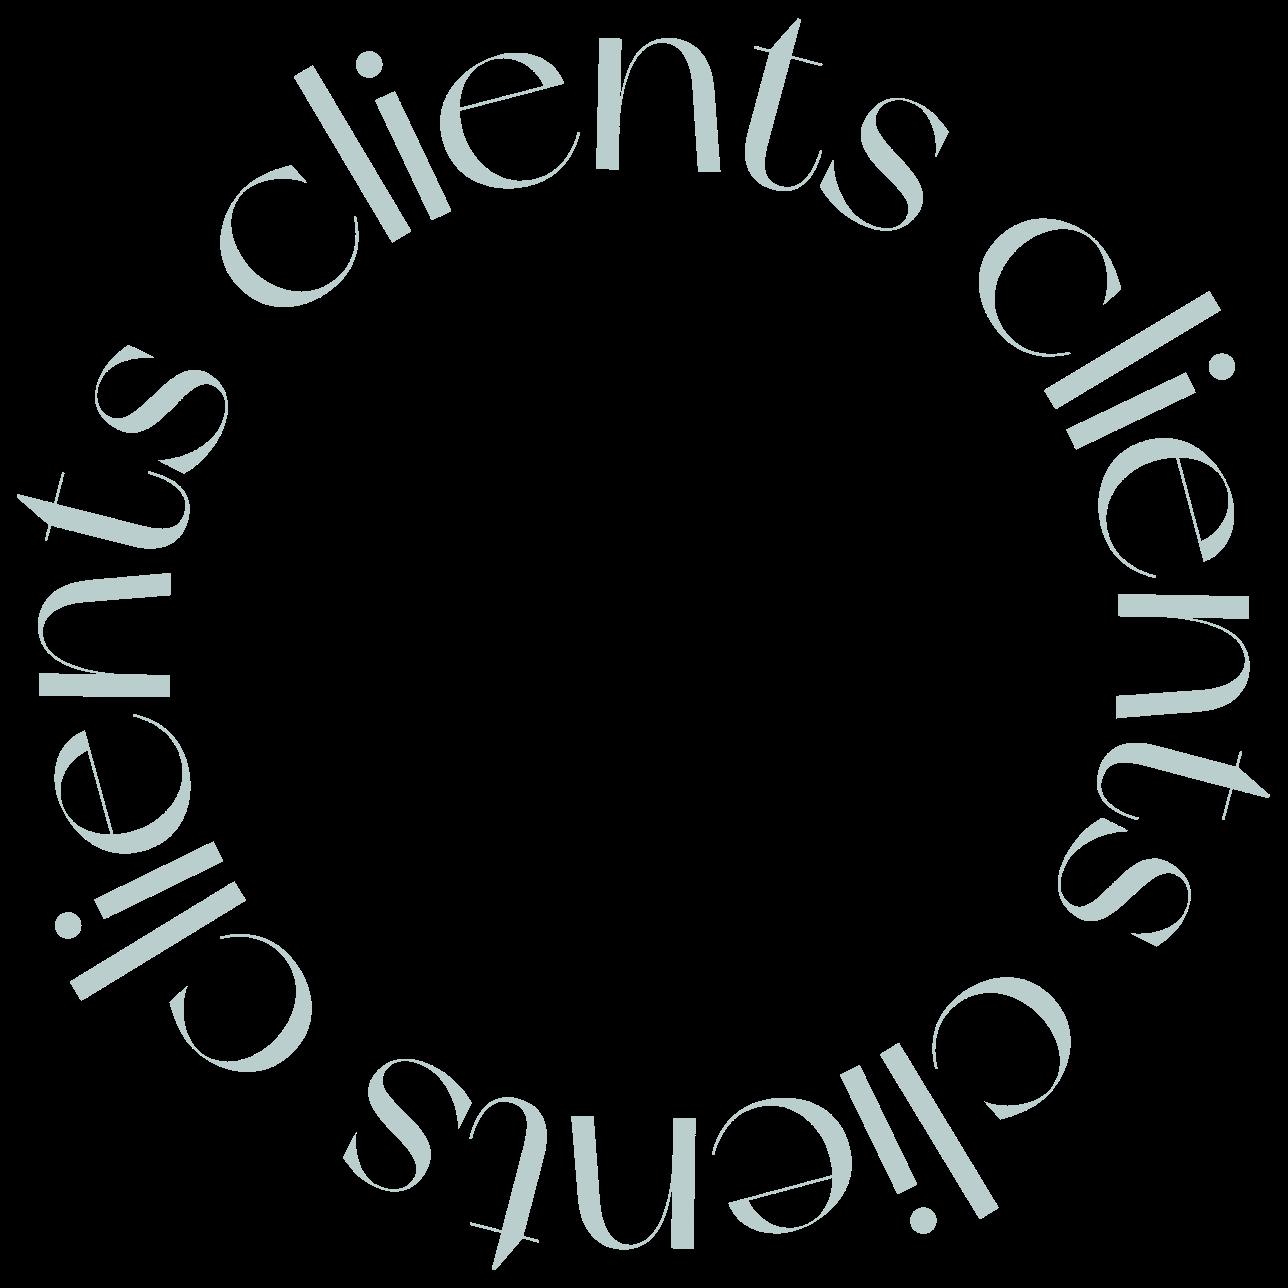 cb circle clients text